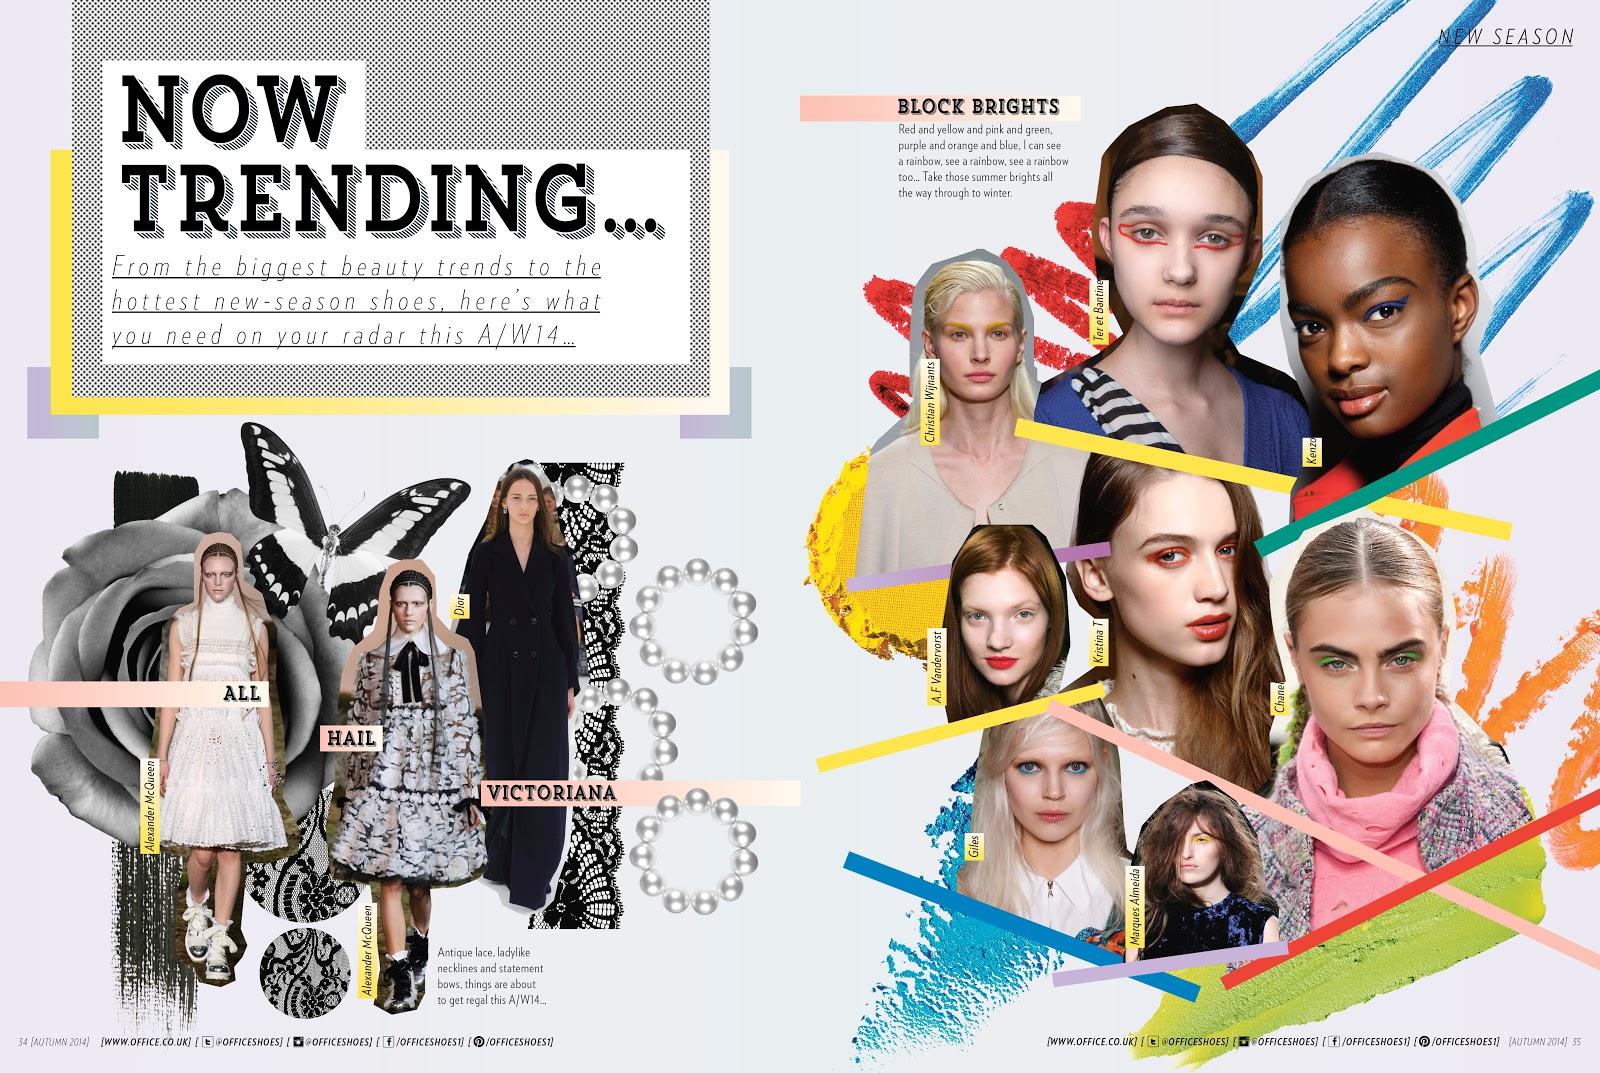 Zuki_Turner_Graphic design_new-season trends.jpg